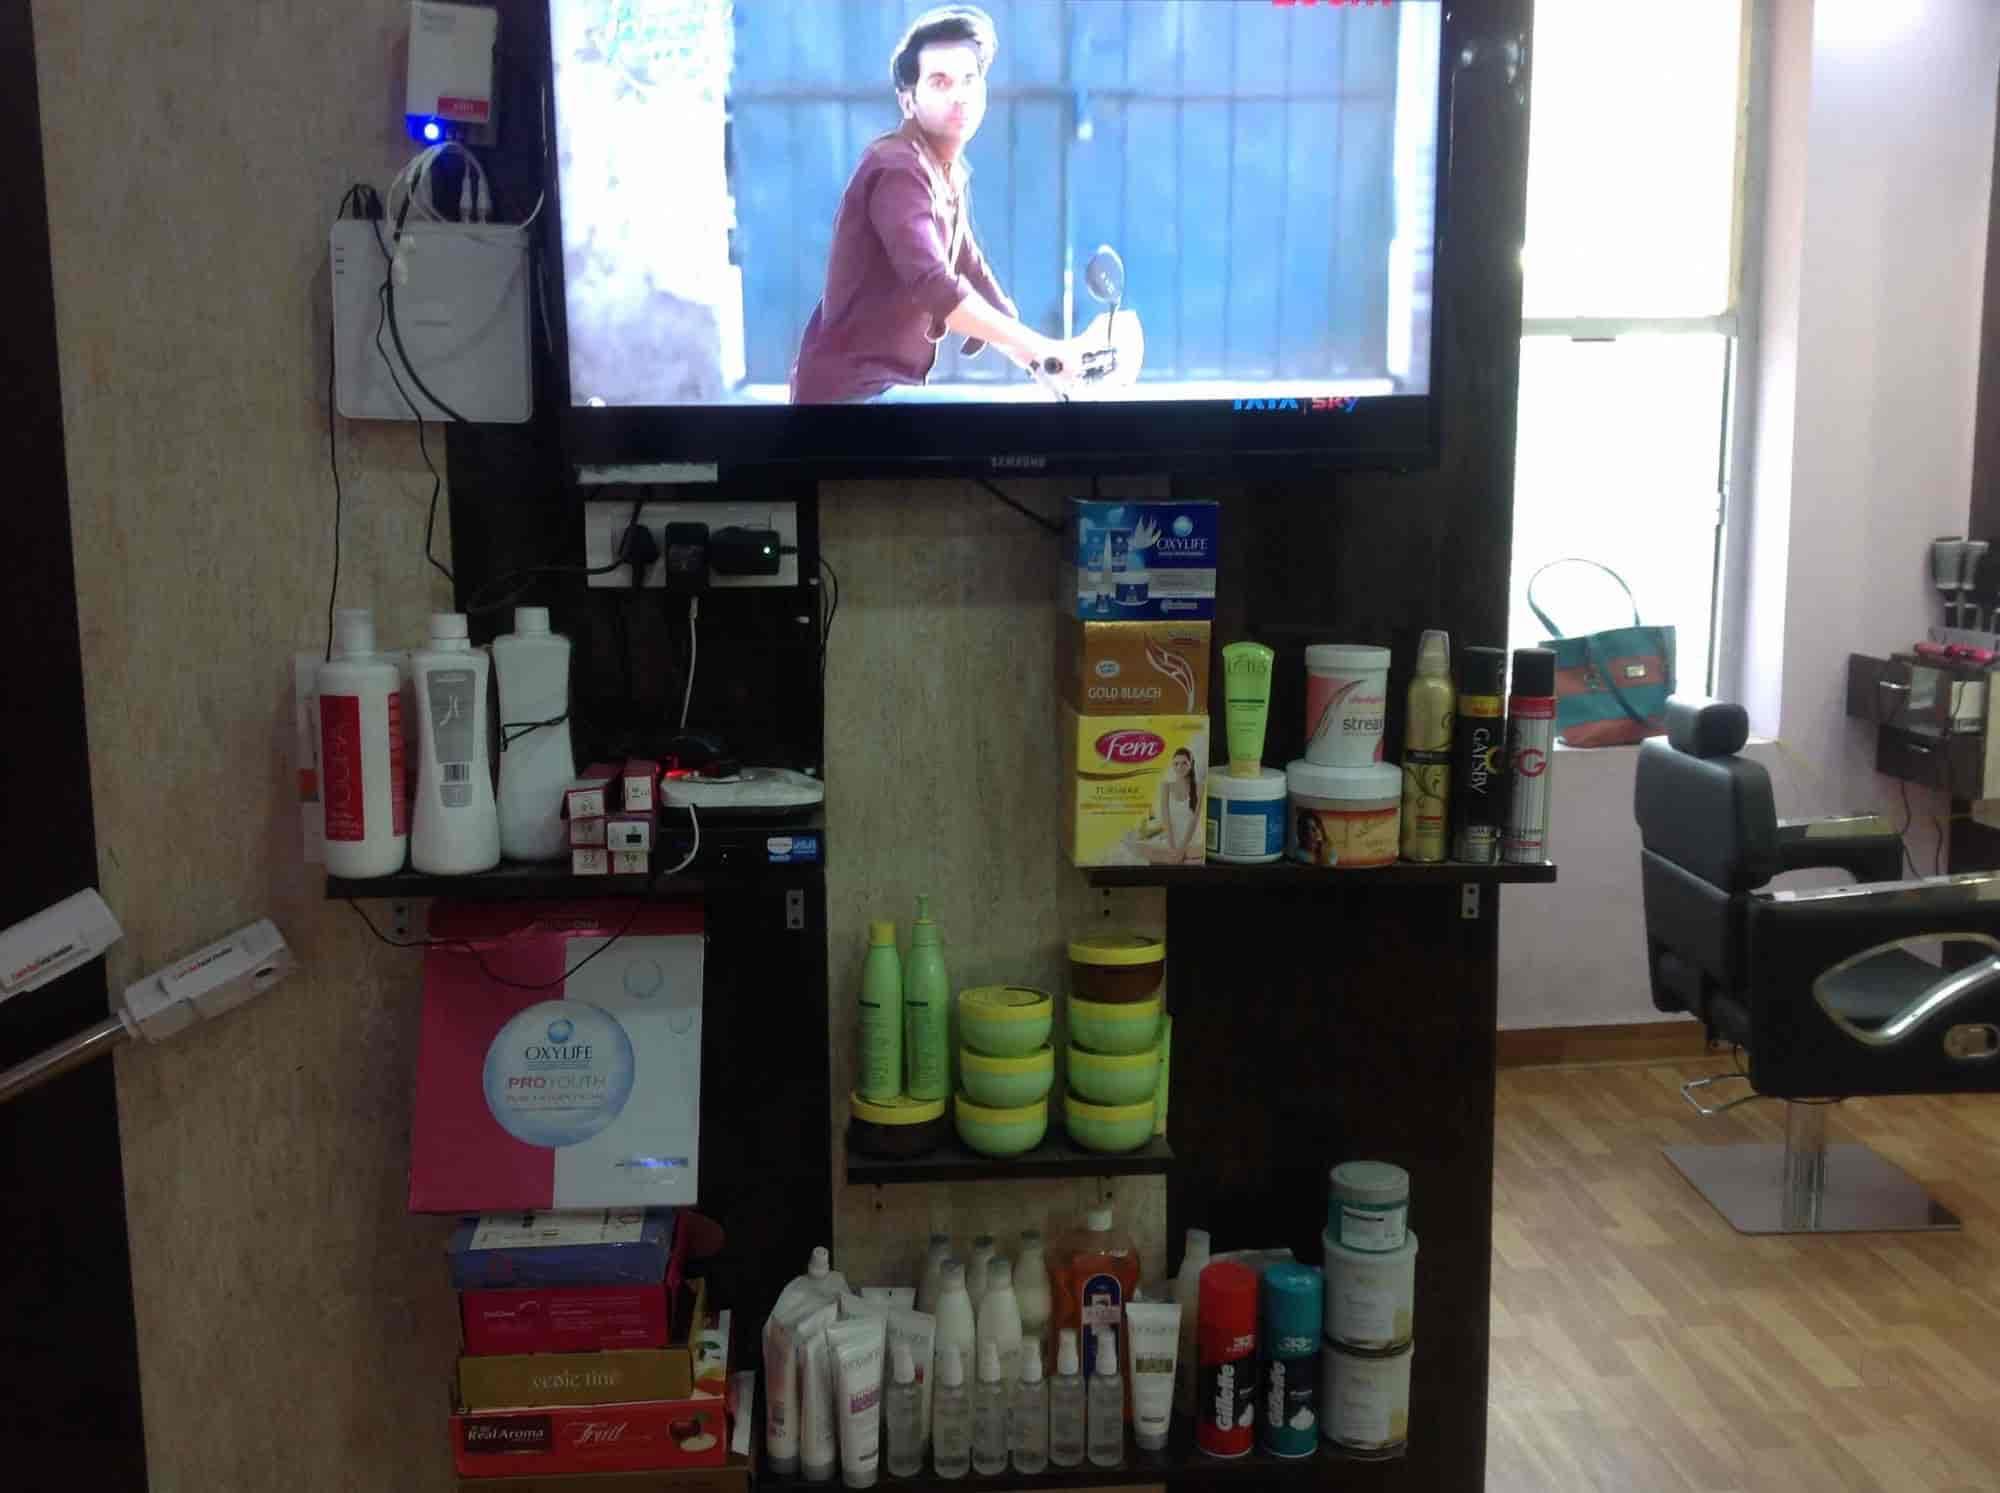 Big Care Unisex Salon, Faridabad Sector 31 - Unisex Beauty